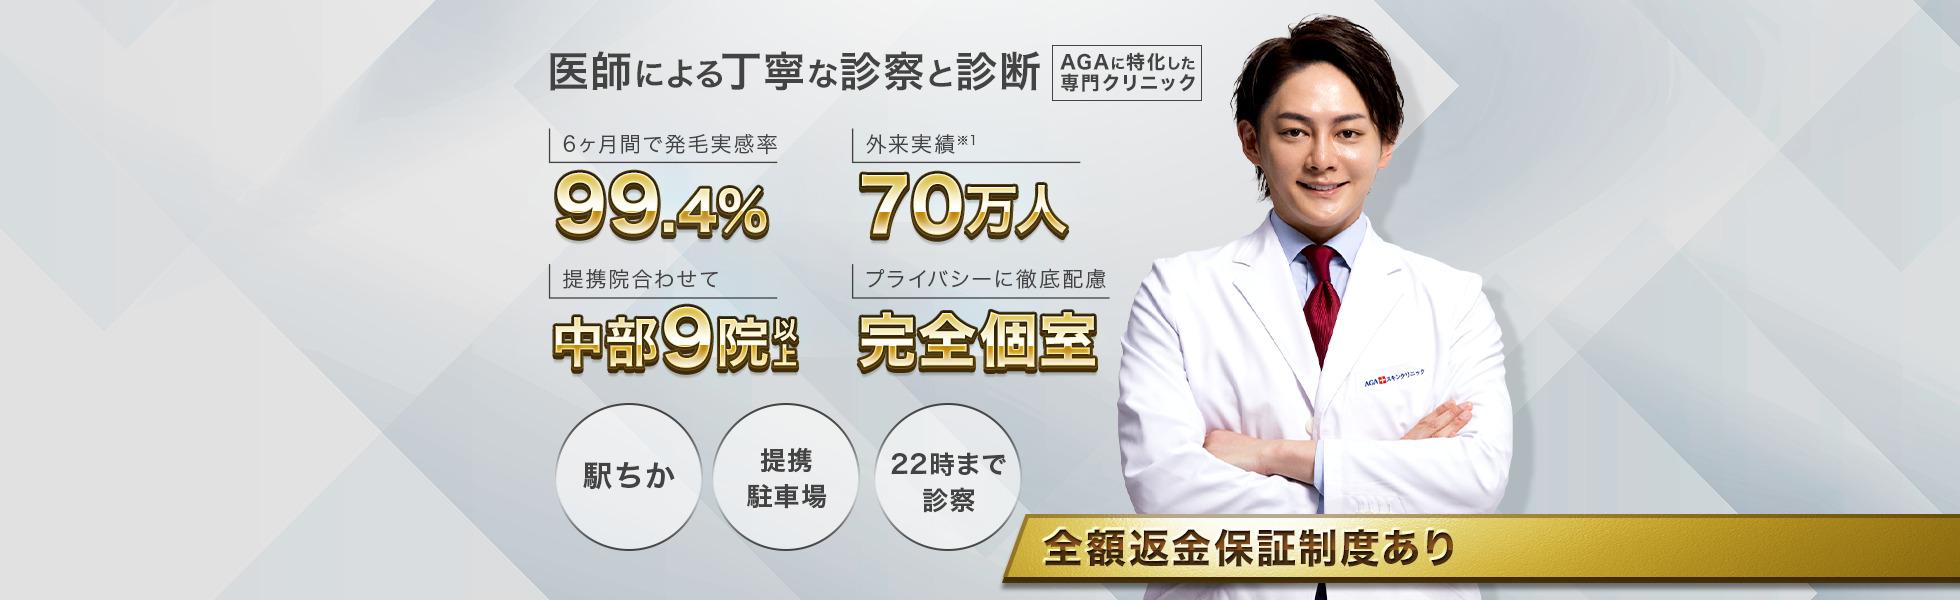 AGAスキンクリニック 名駅錦通院【名古屋院・名古屋栄院】